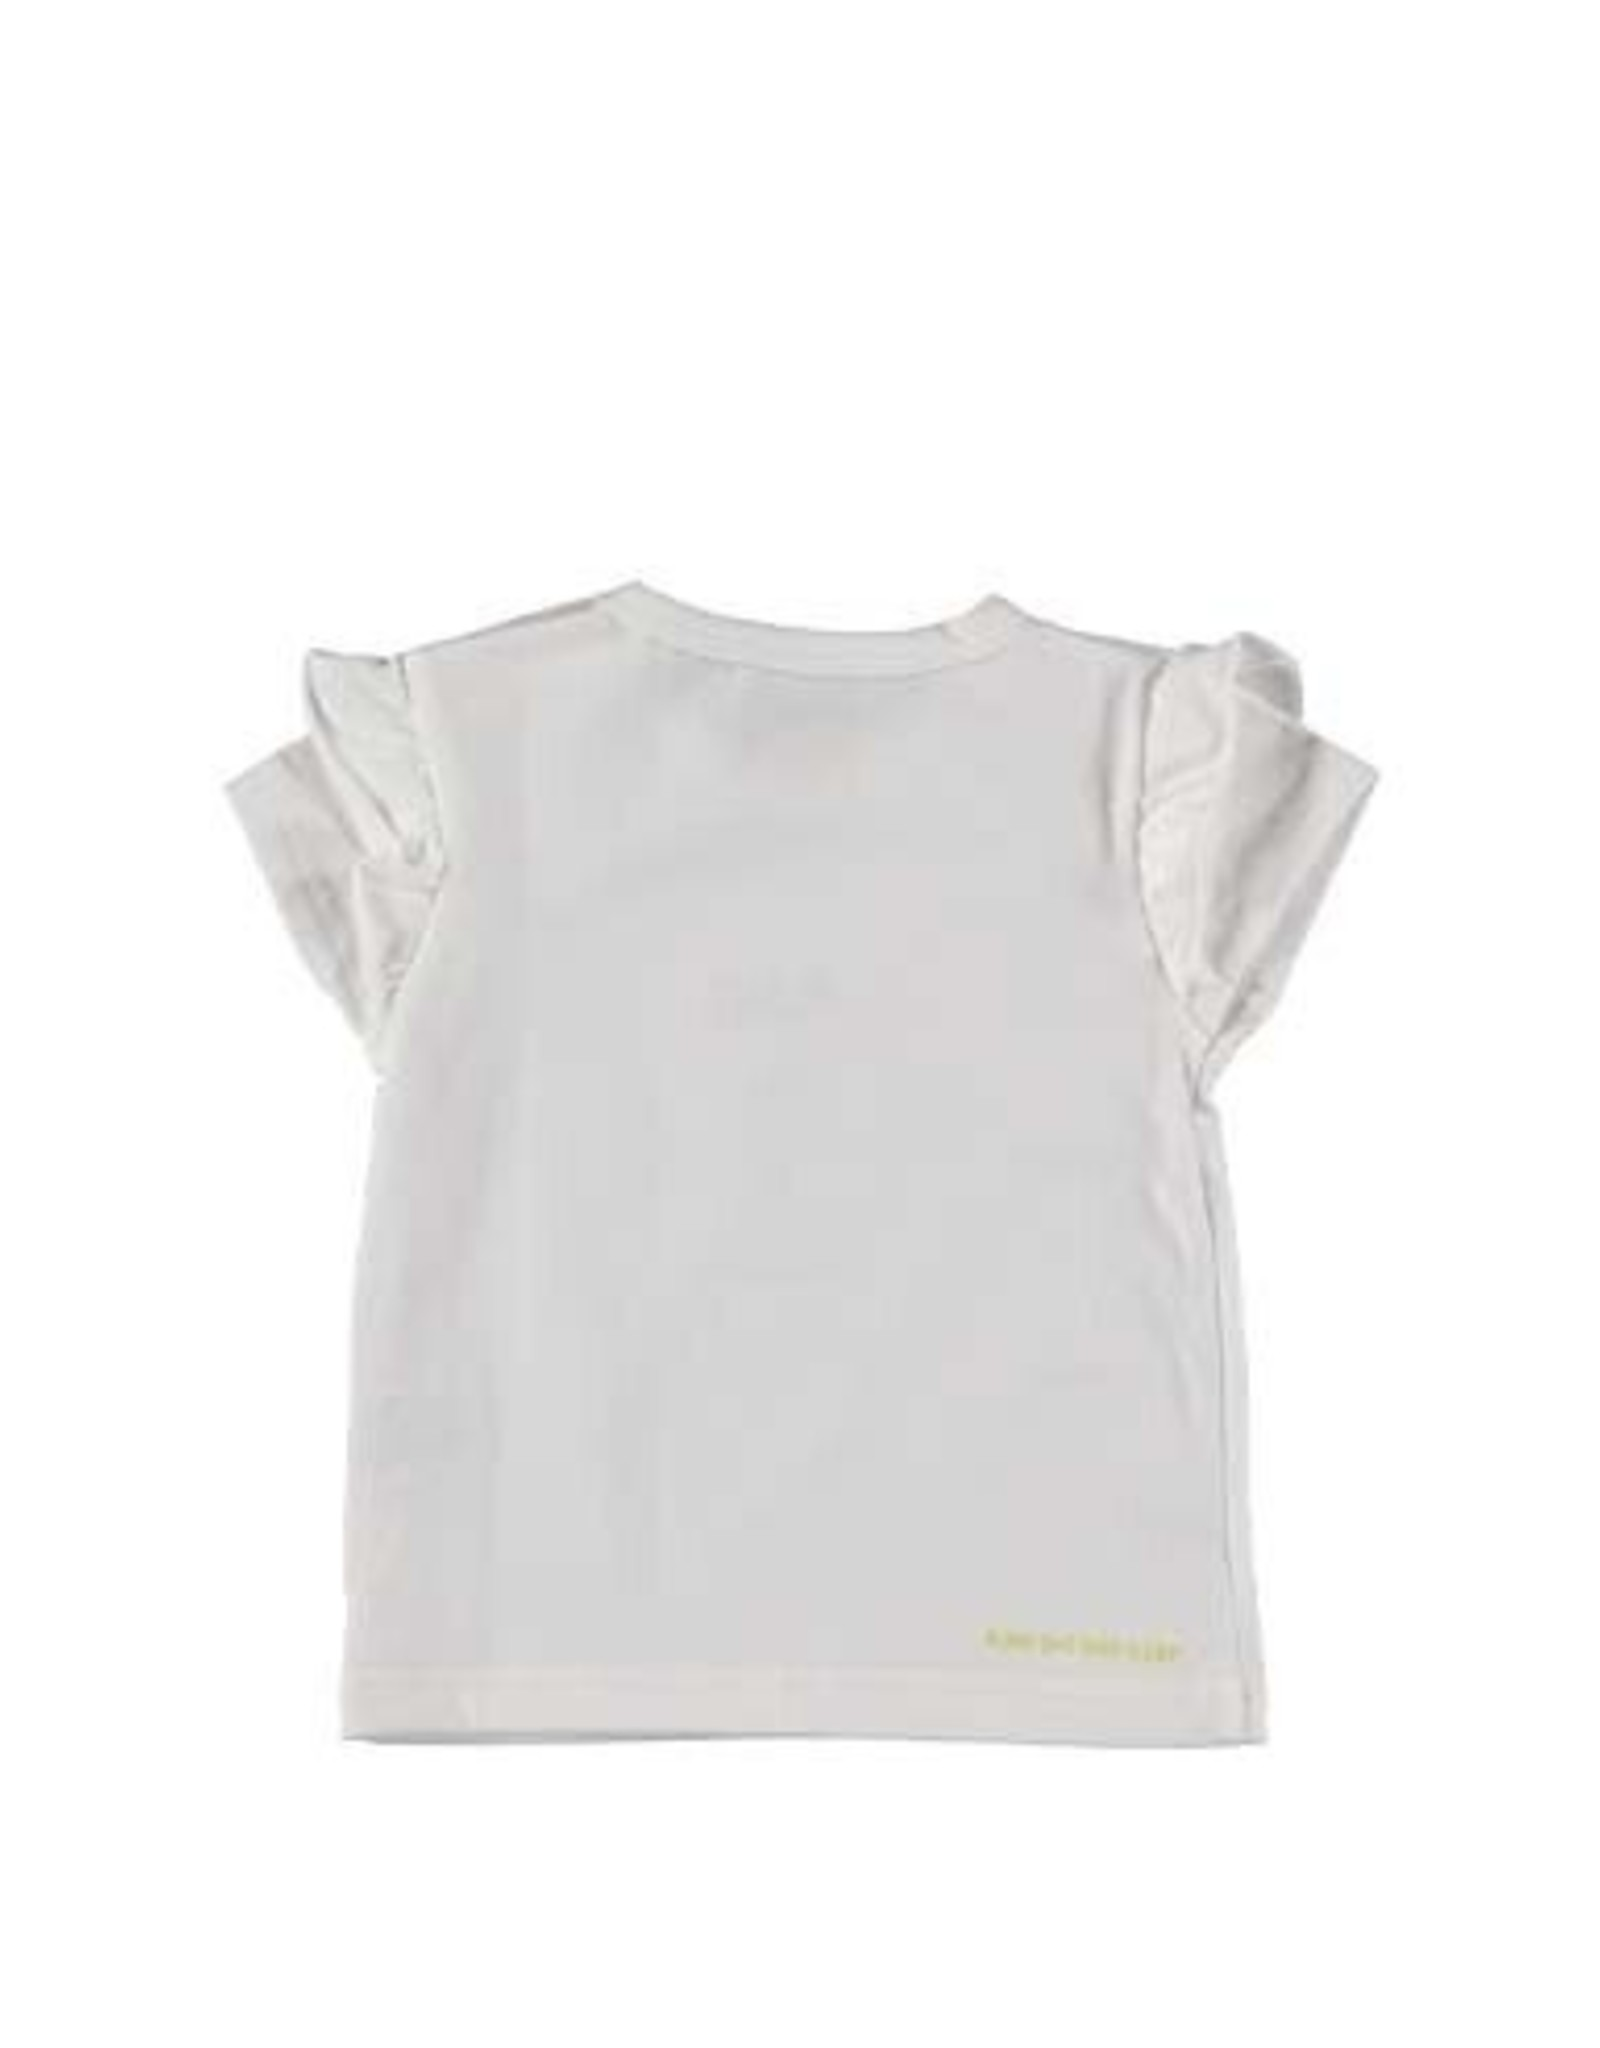 BESS Bess White Shirt Sh.sl. Love